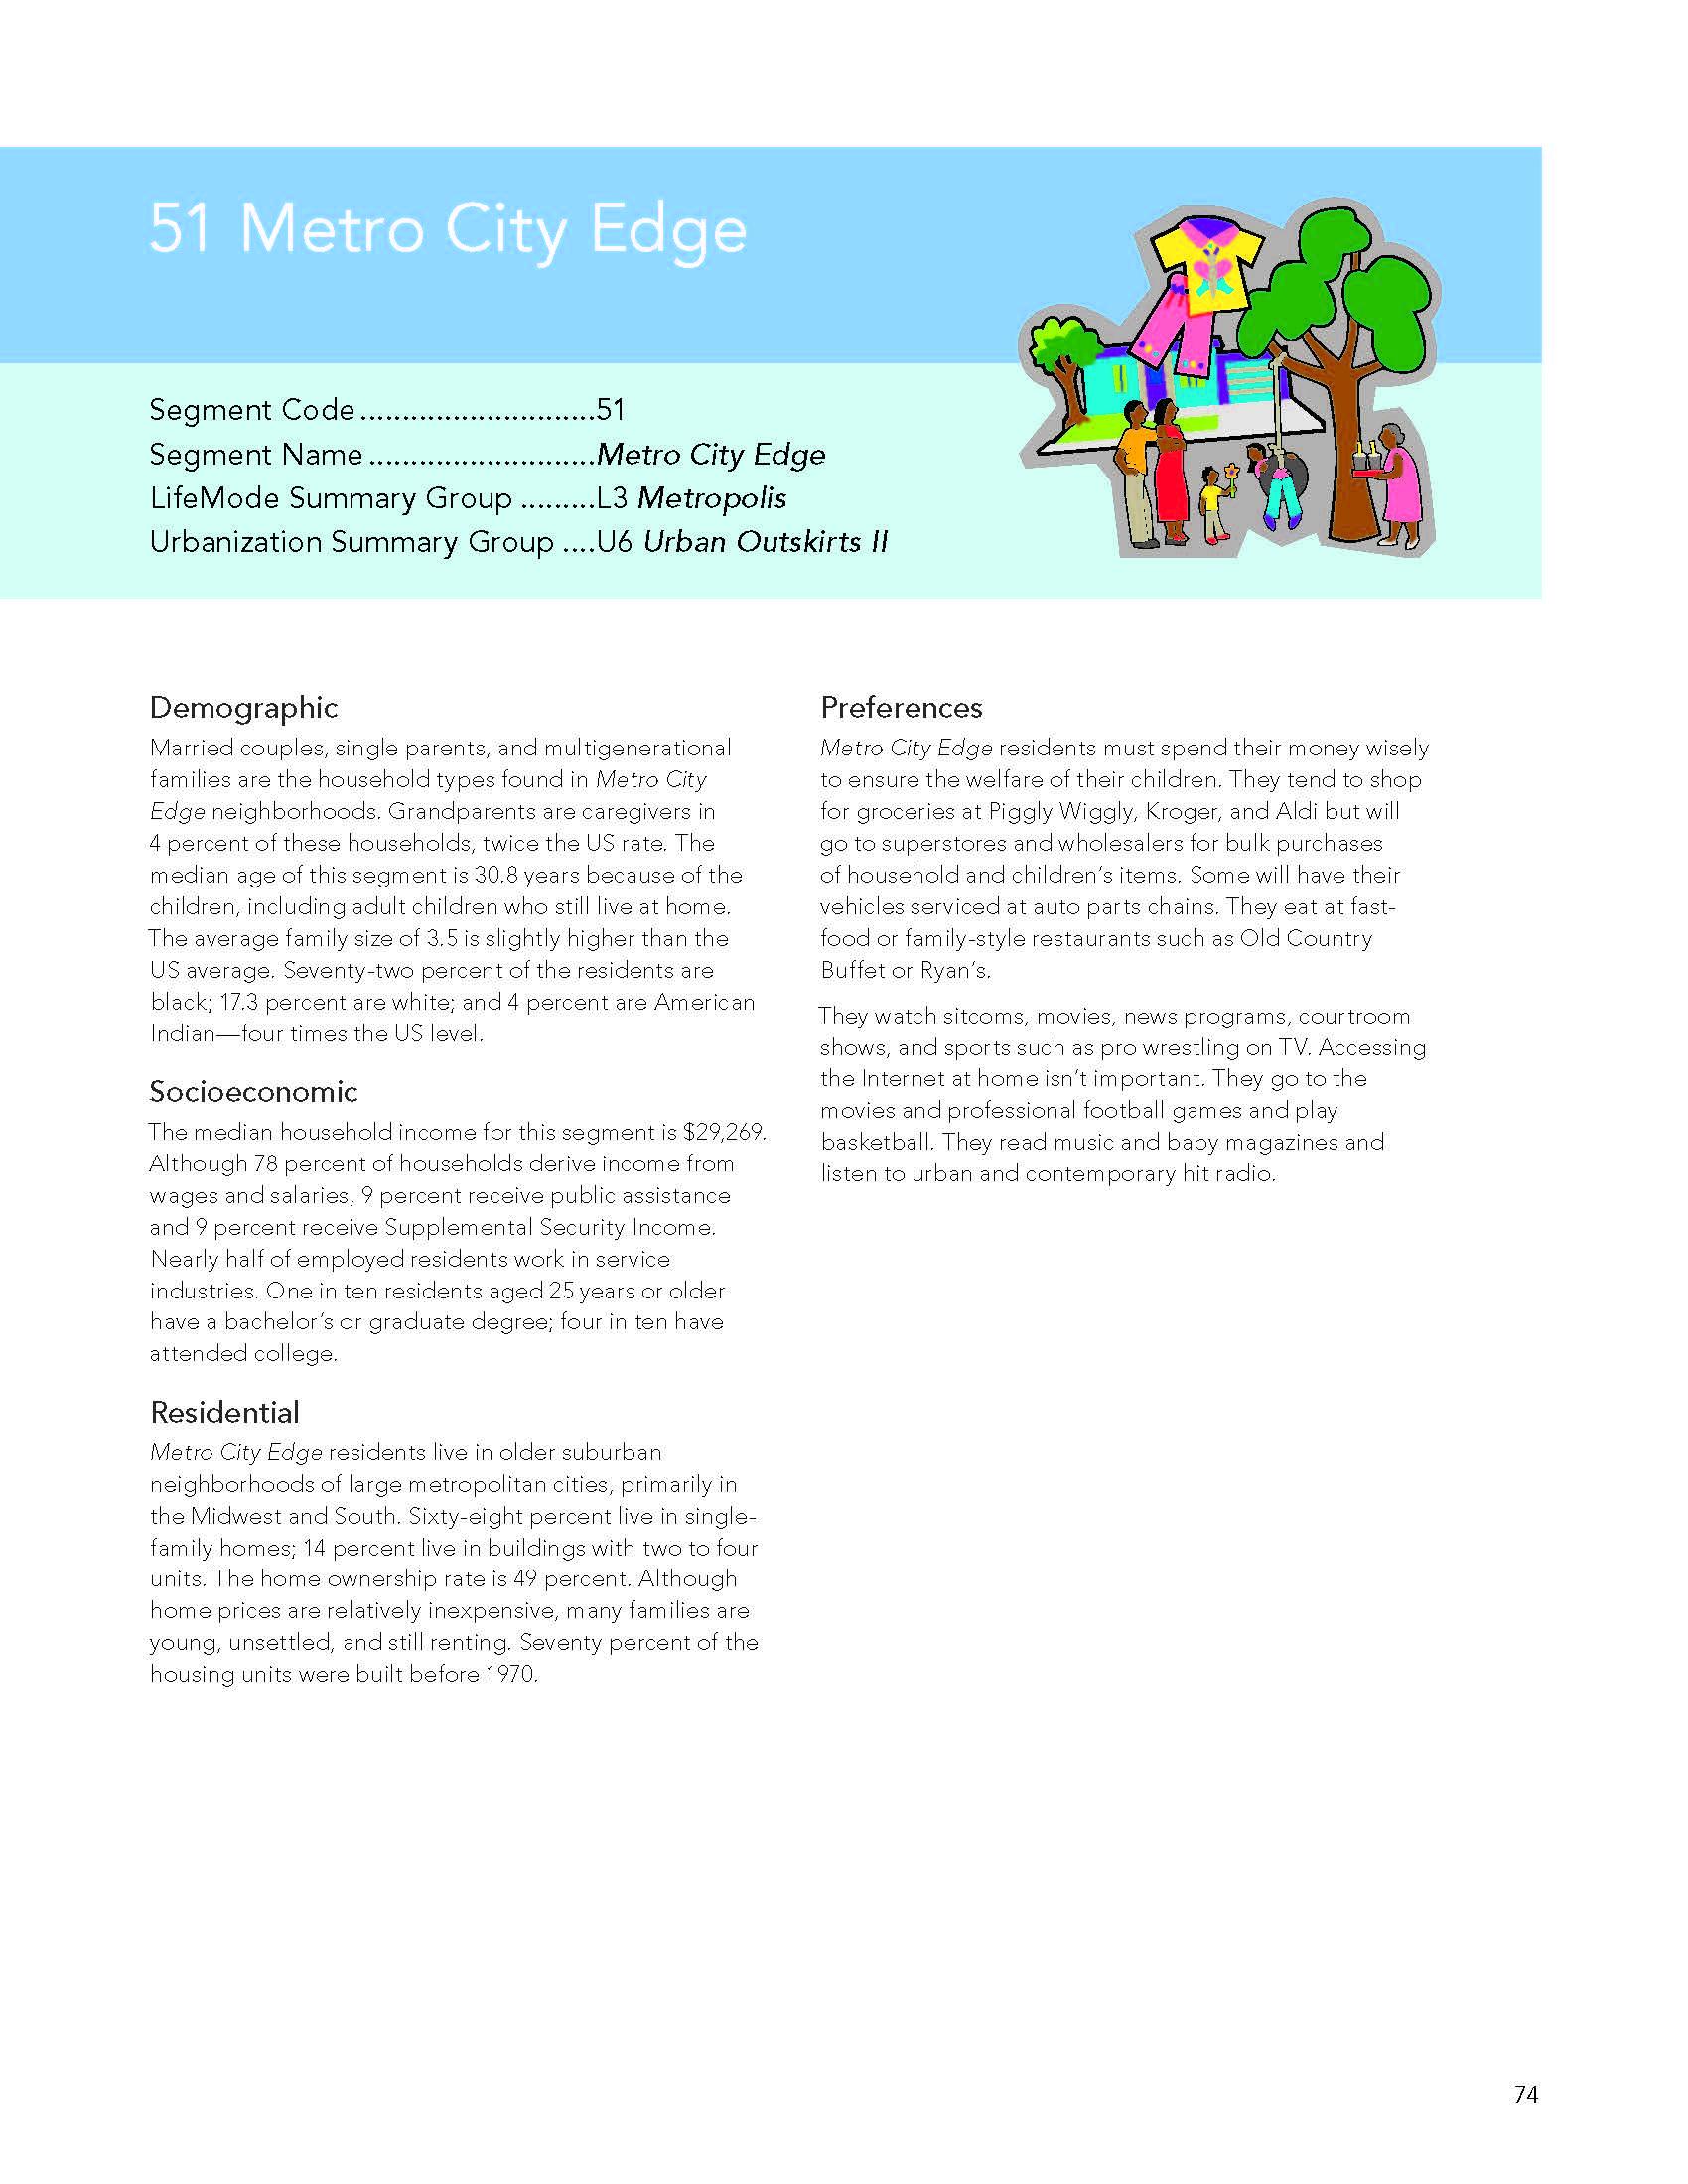 tapestry-segmentation_Page_77.jpg